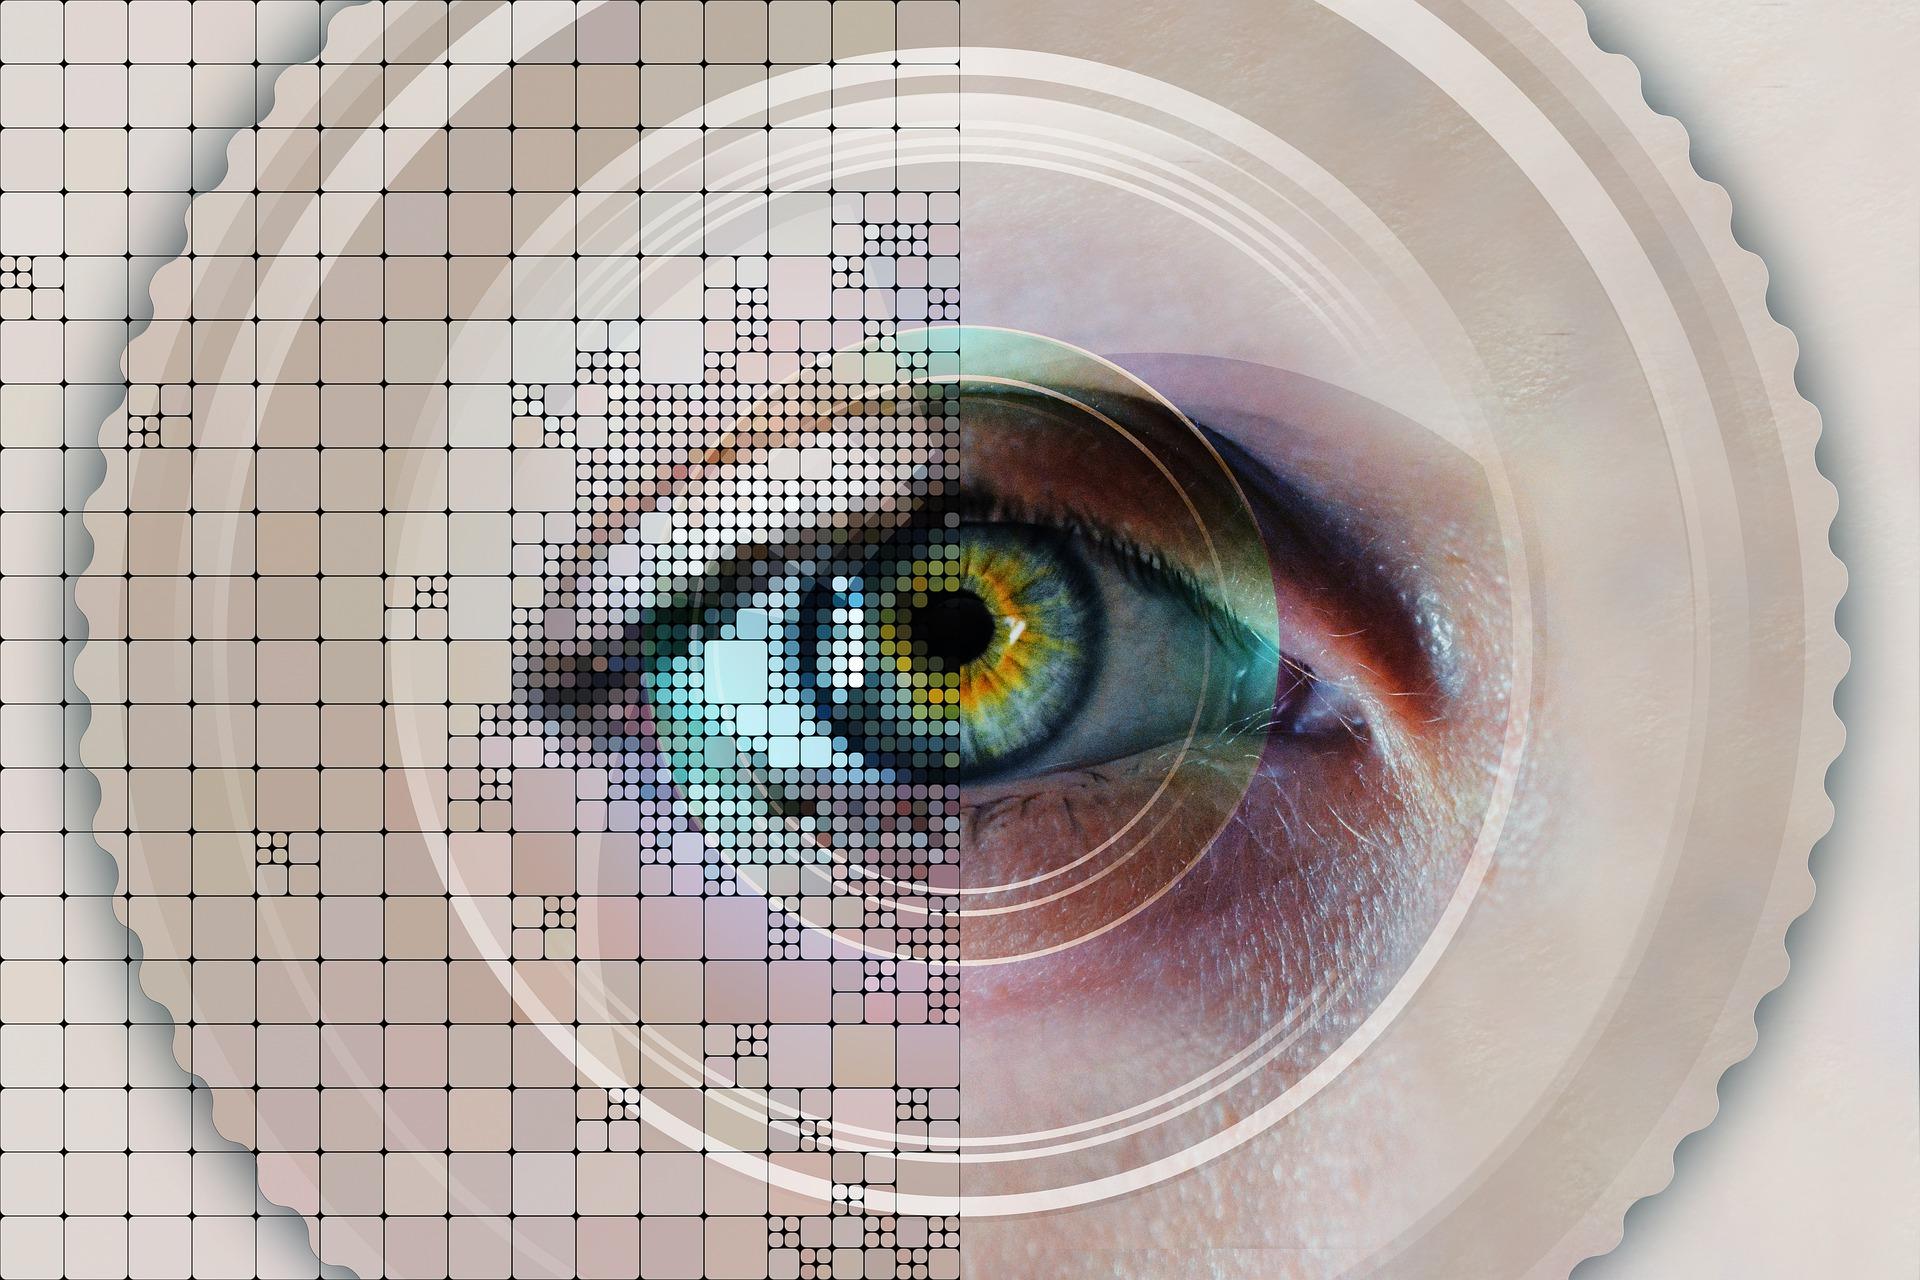 Pangiam acquires verScan biometrics system for travel